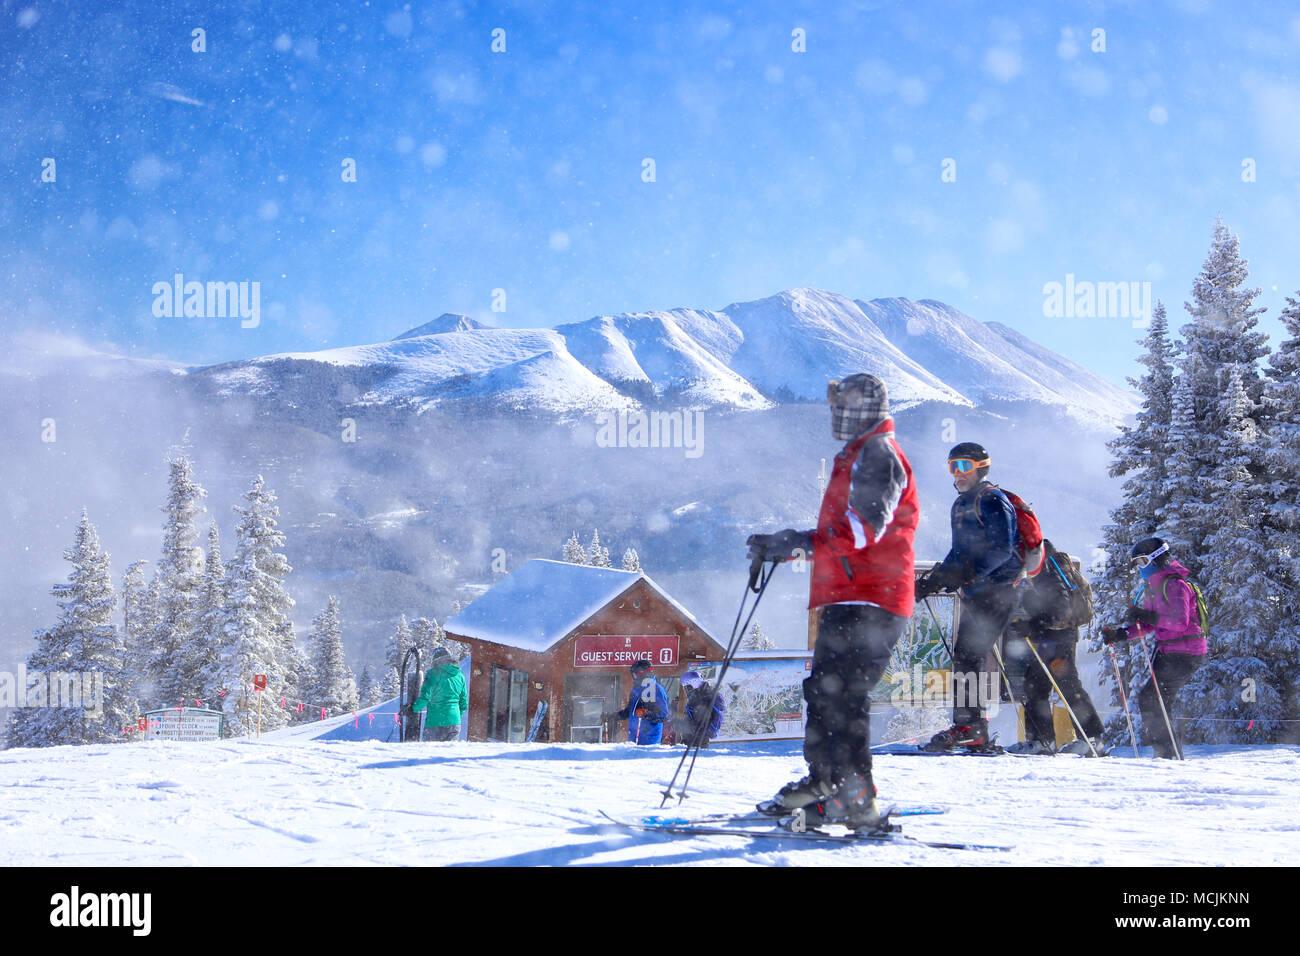 Downhill alpine skiing in Colorado at Breckenridge ski resort - Stock Image